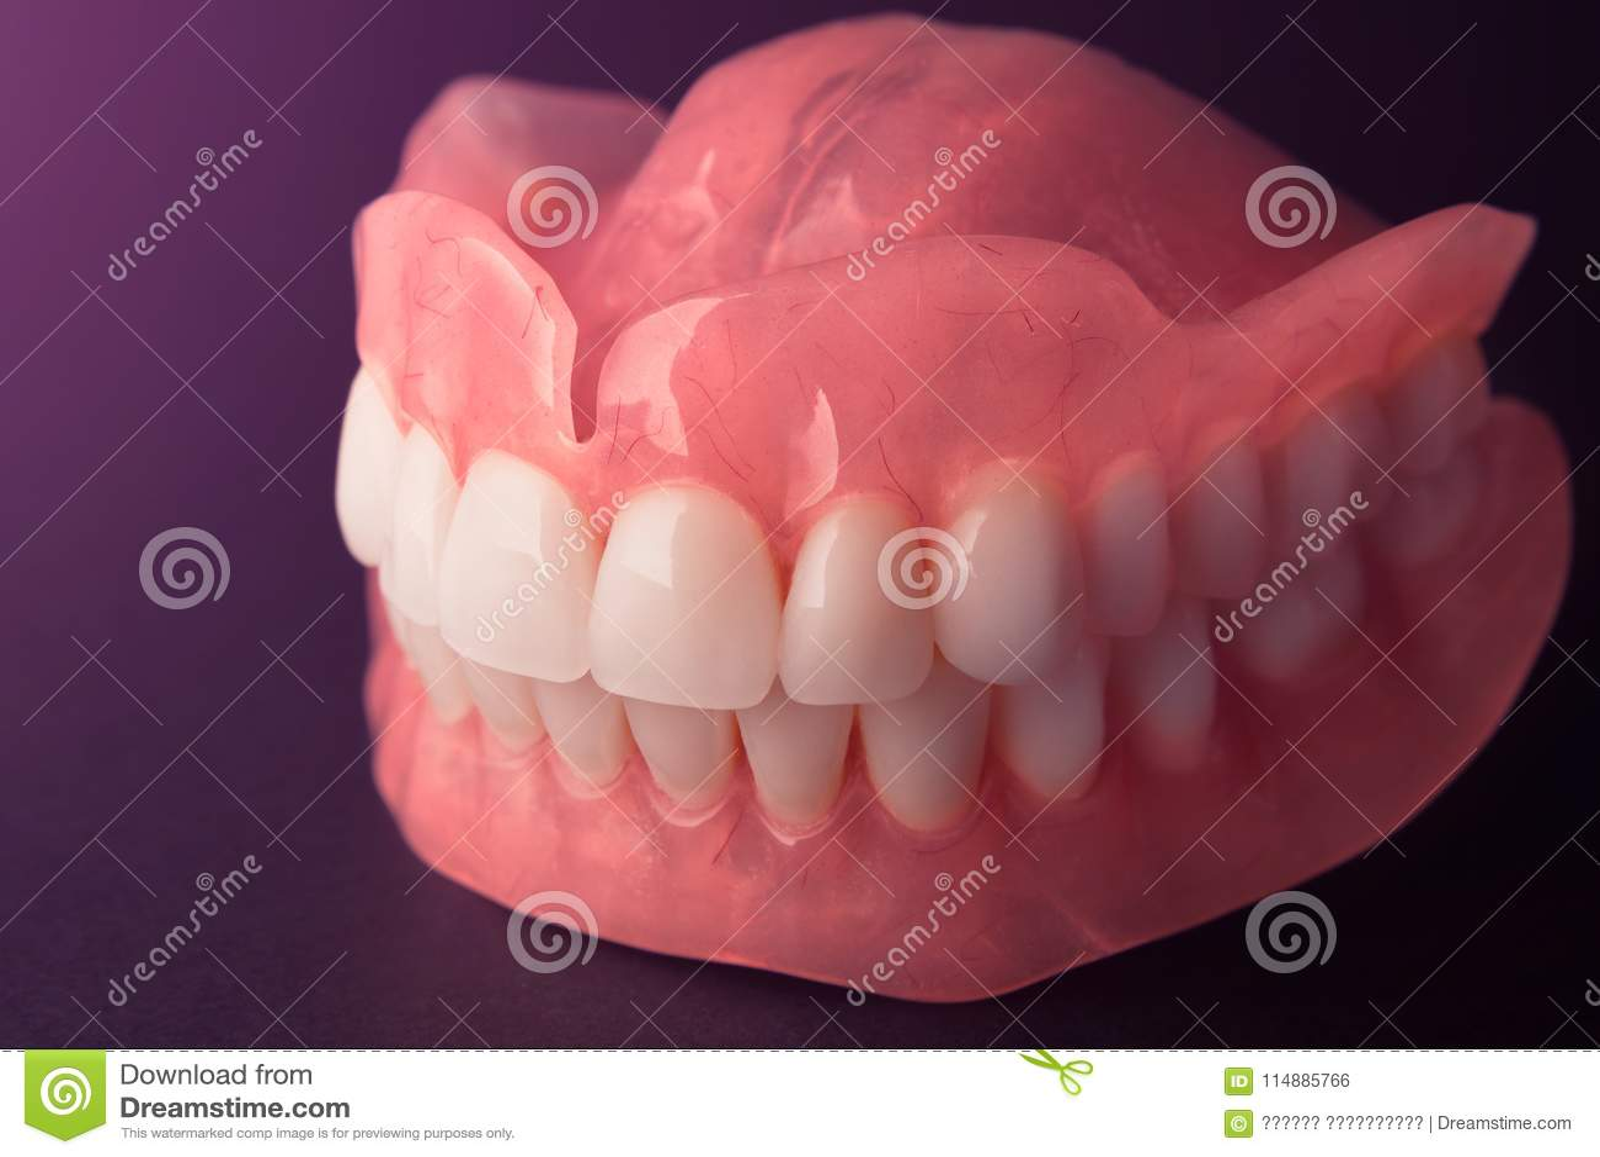 Medical orthopedic dentistry 90